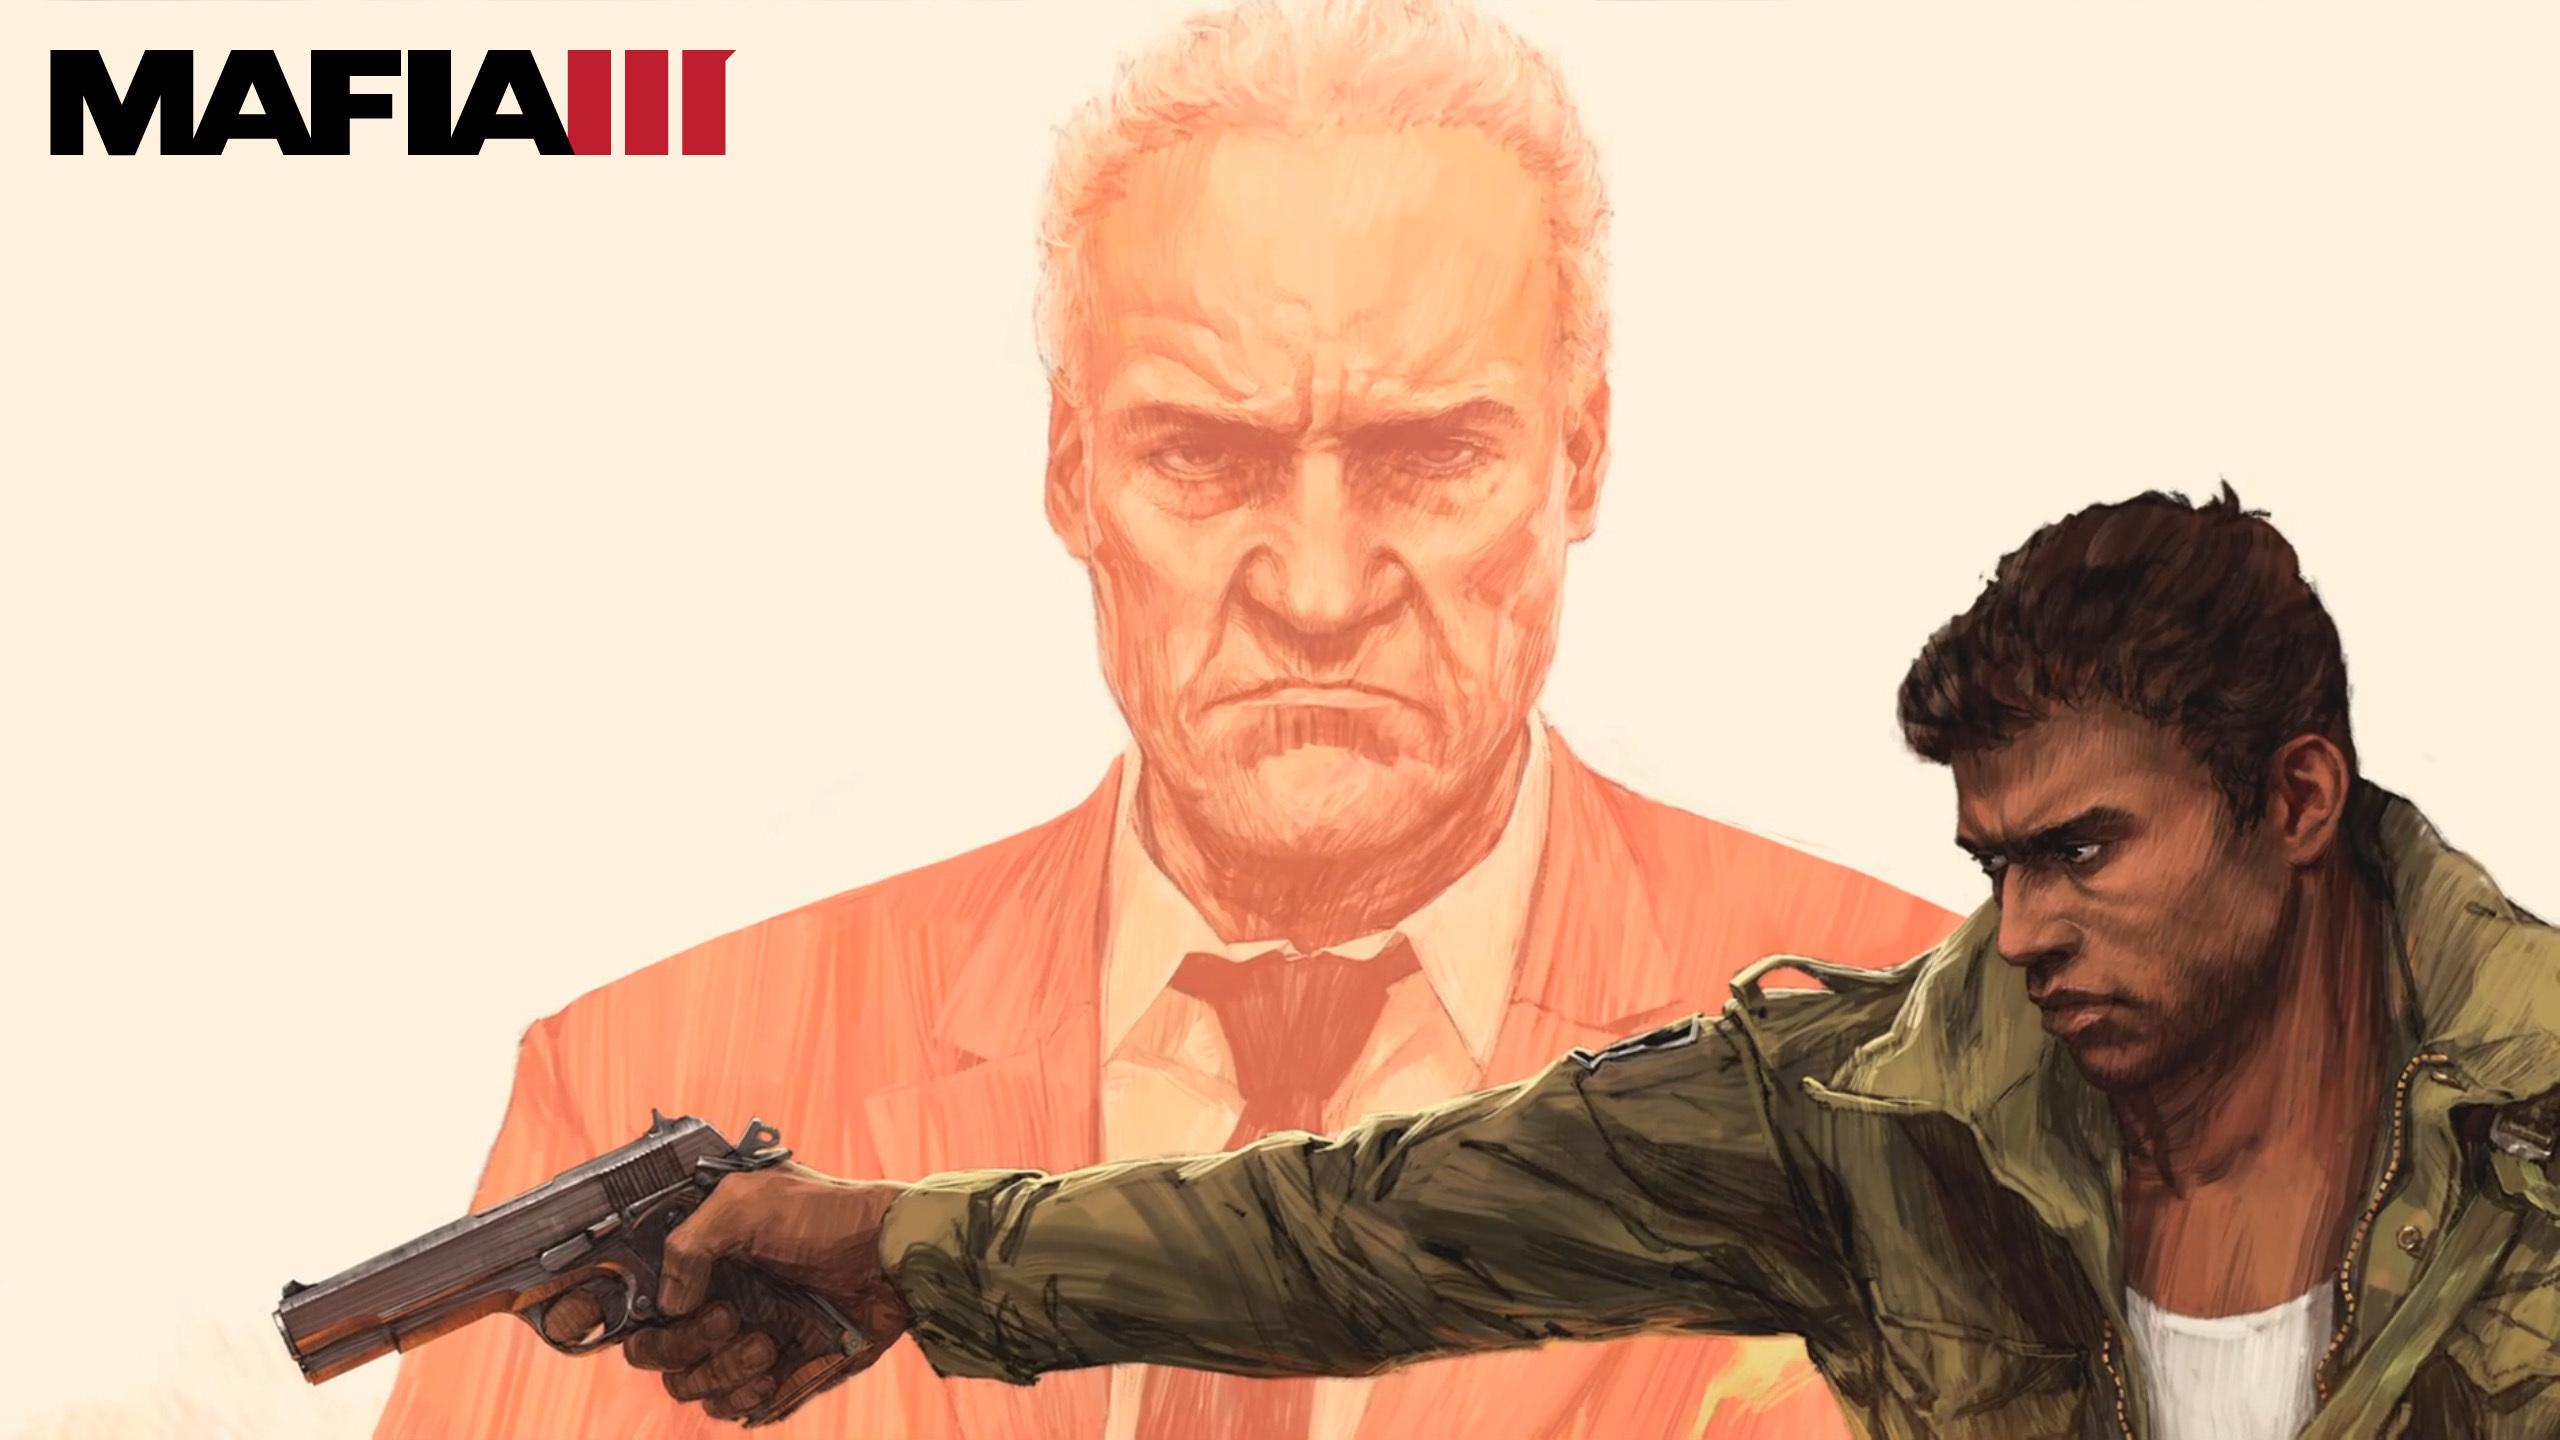 Mafia 3 Background